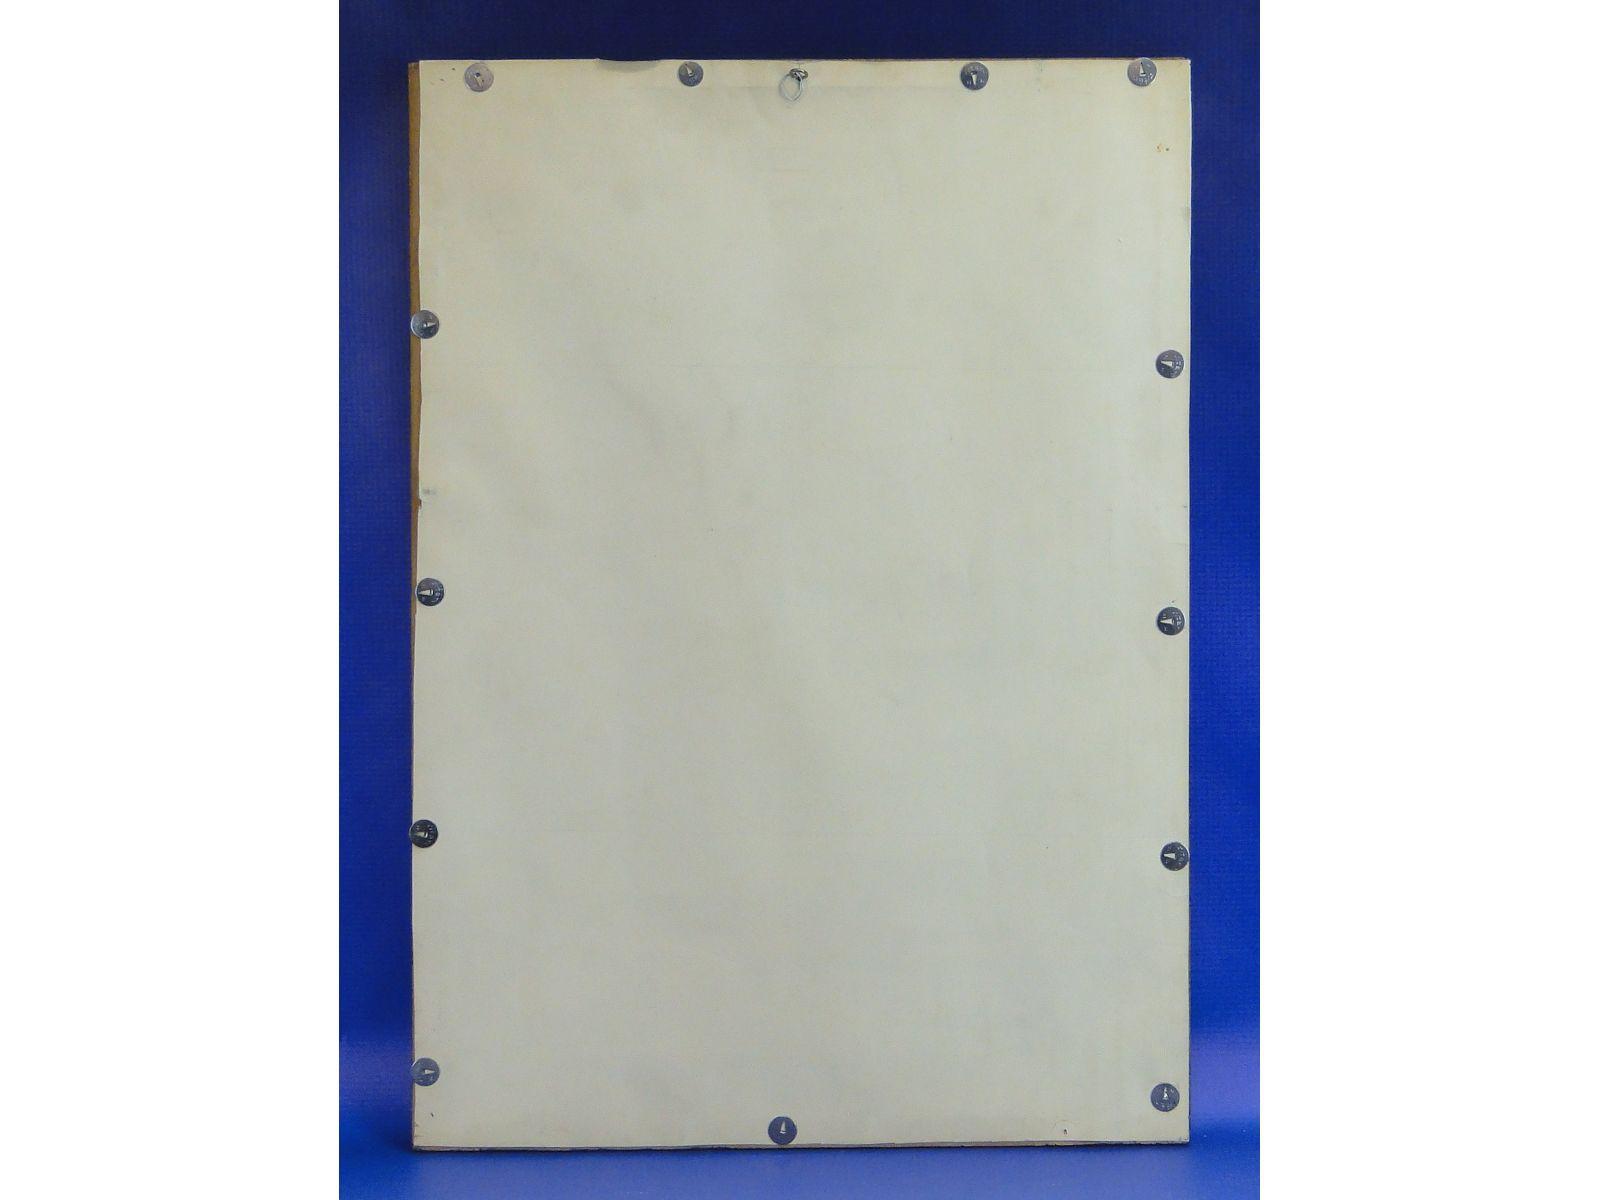 DSC02800.JPG (1600�1200)